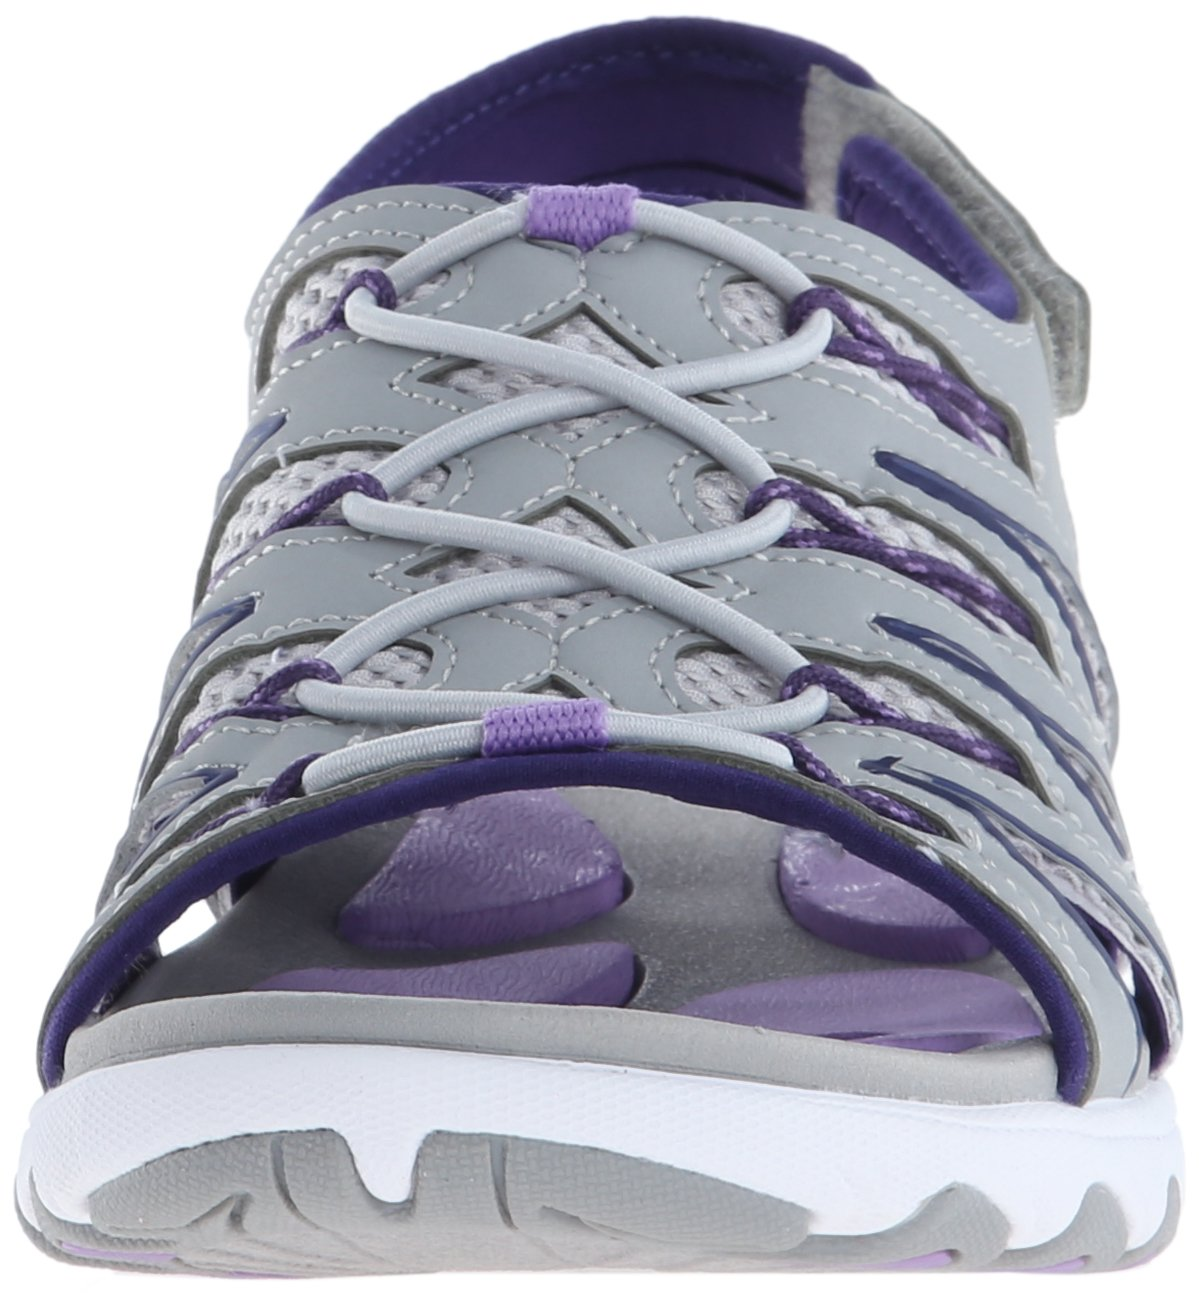 Ryka Women's Glance Athletic Sandal B0128LRKV0 10 B(M) US Grey/Cool Mist Grey/English Lavender